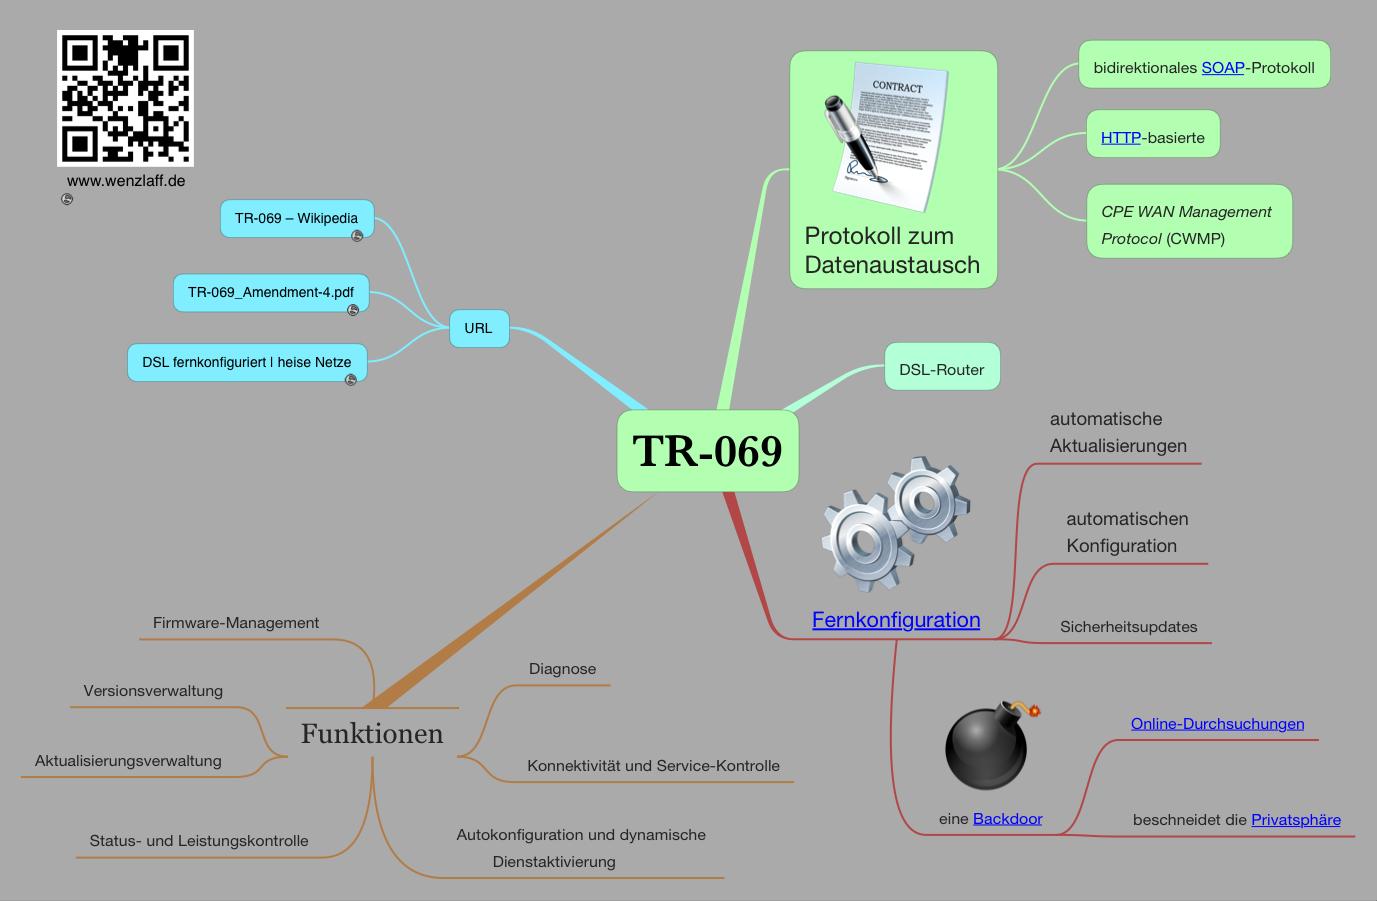 TR-069